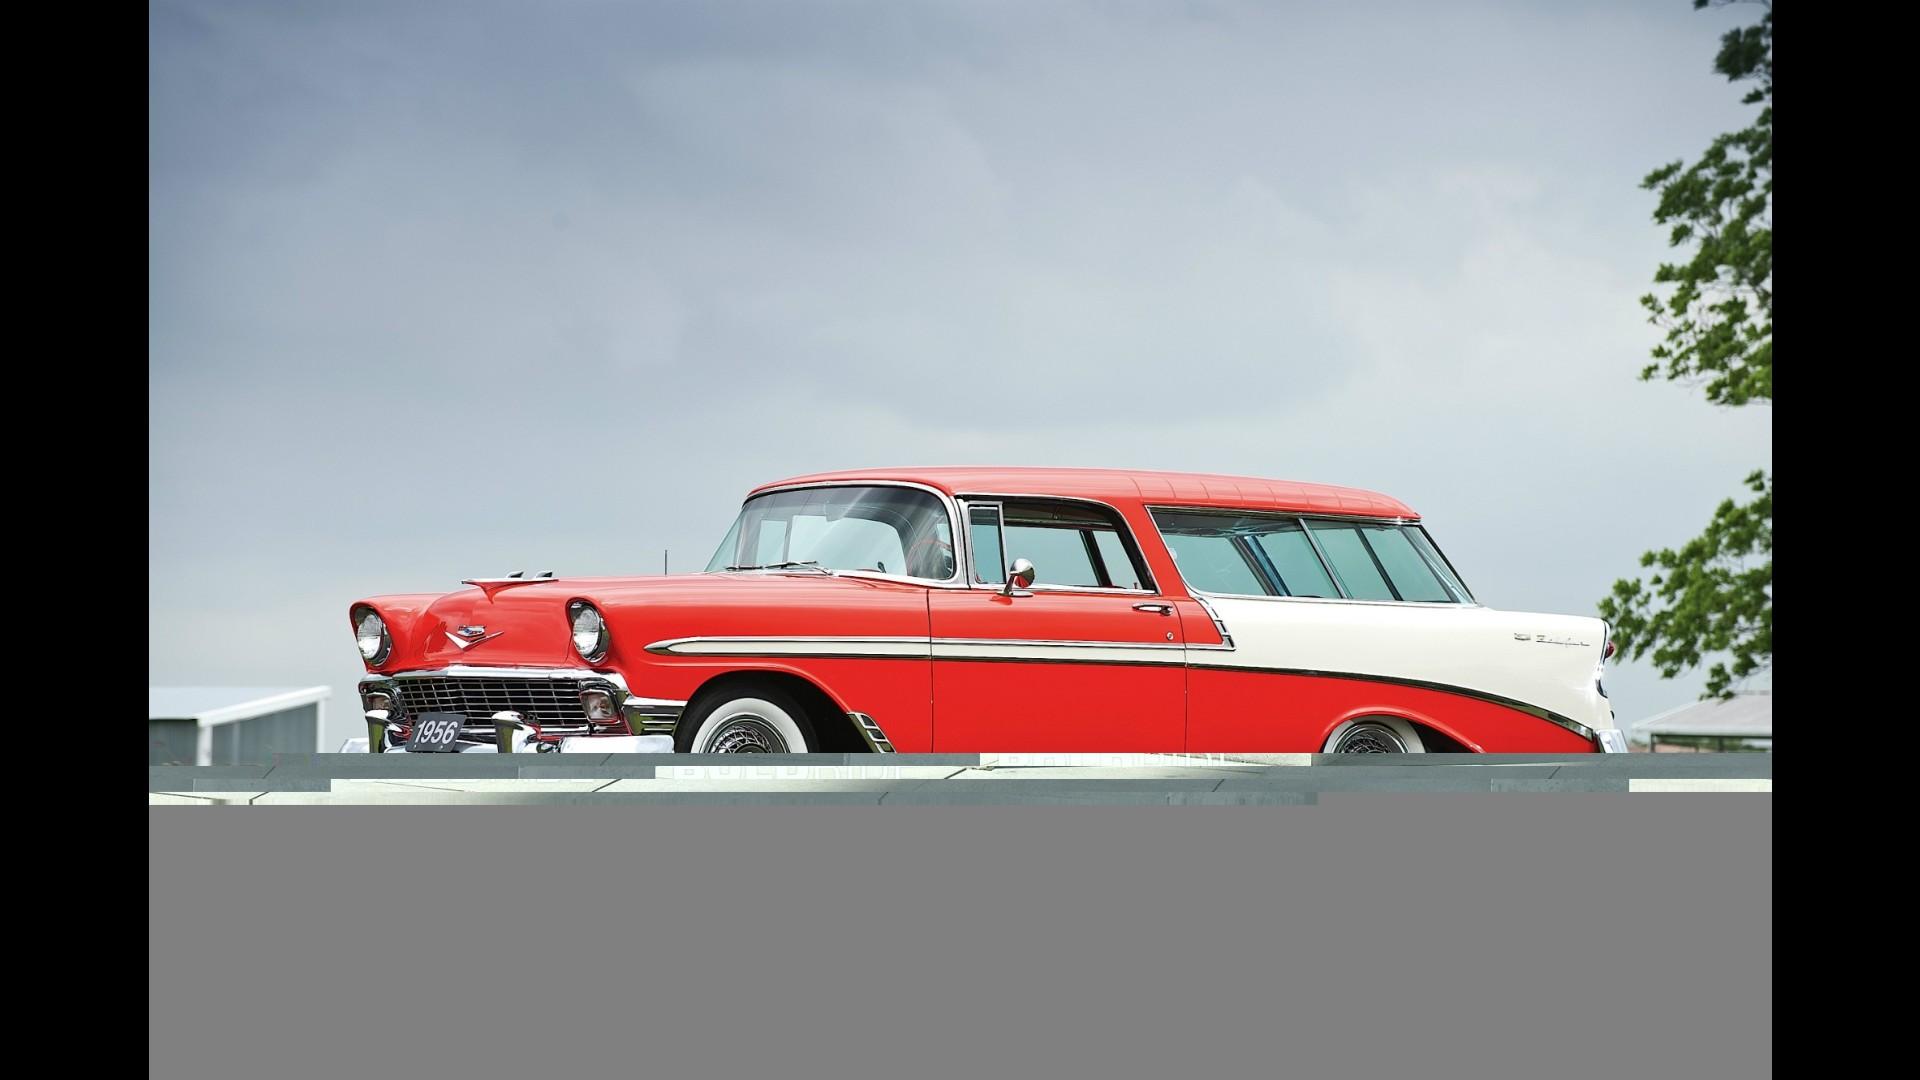 Chevrolet Bel Air Nomad Station Wagon